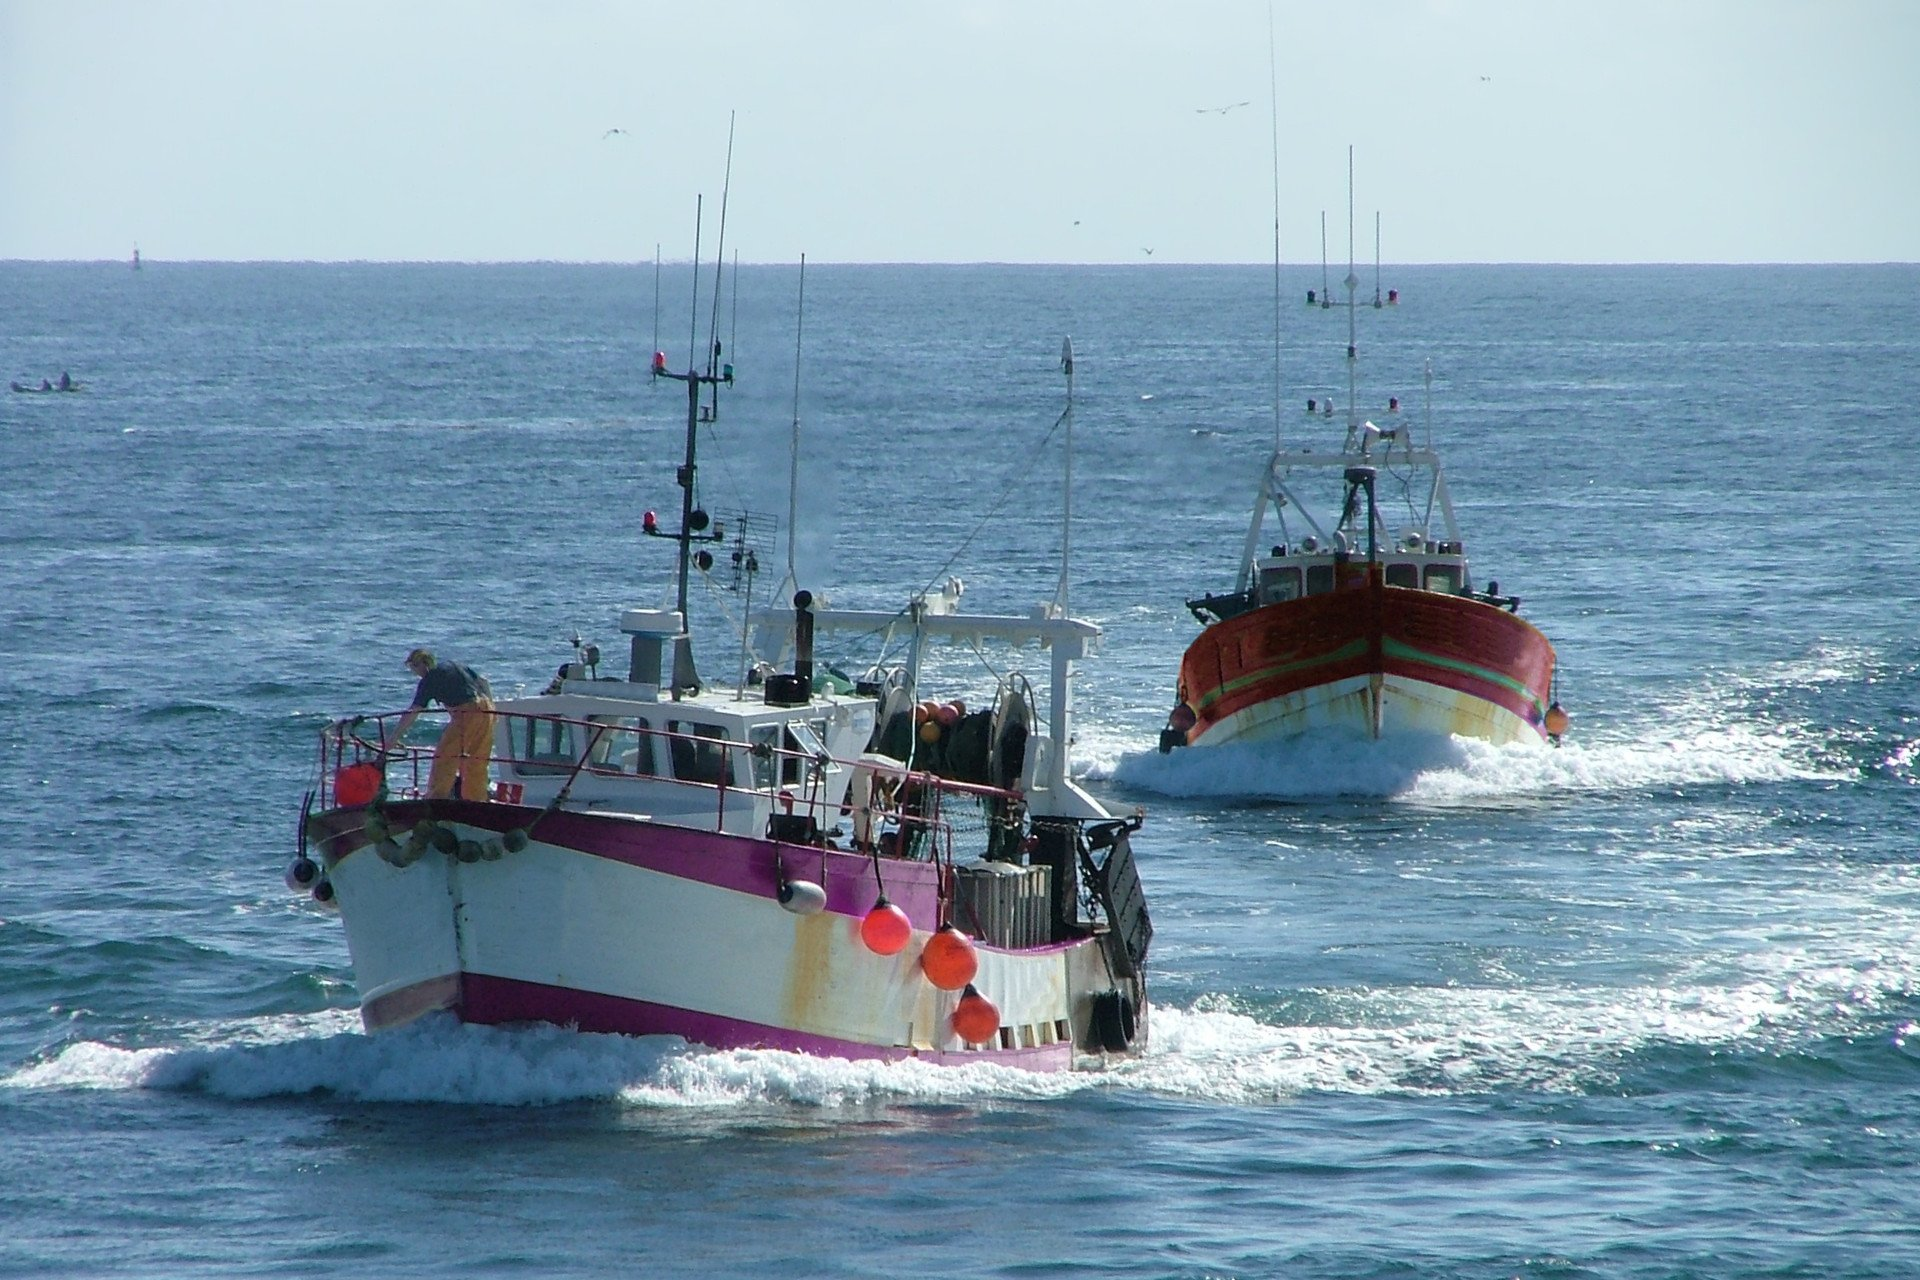 bateau-mer-saint malo-bretagne-france